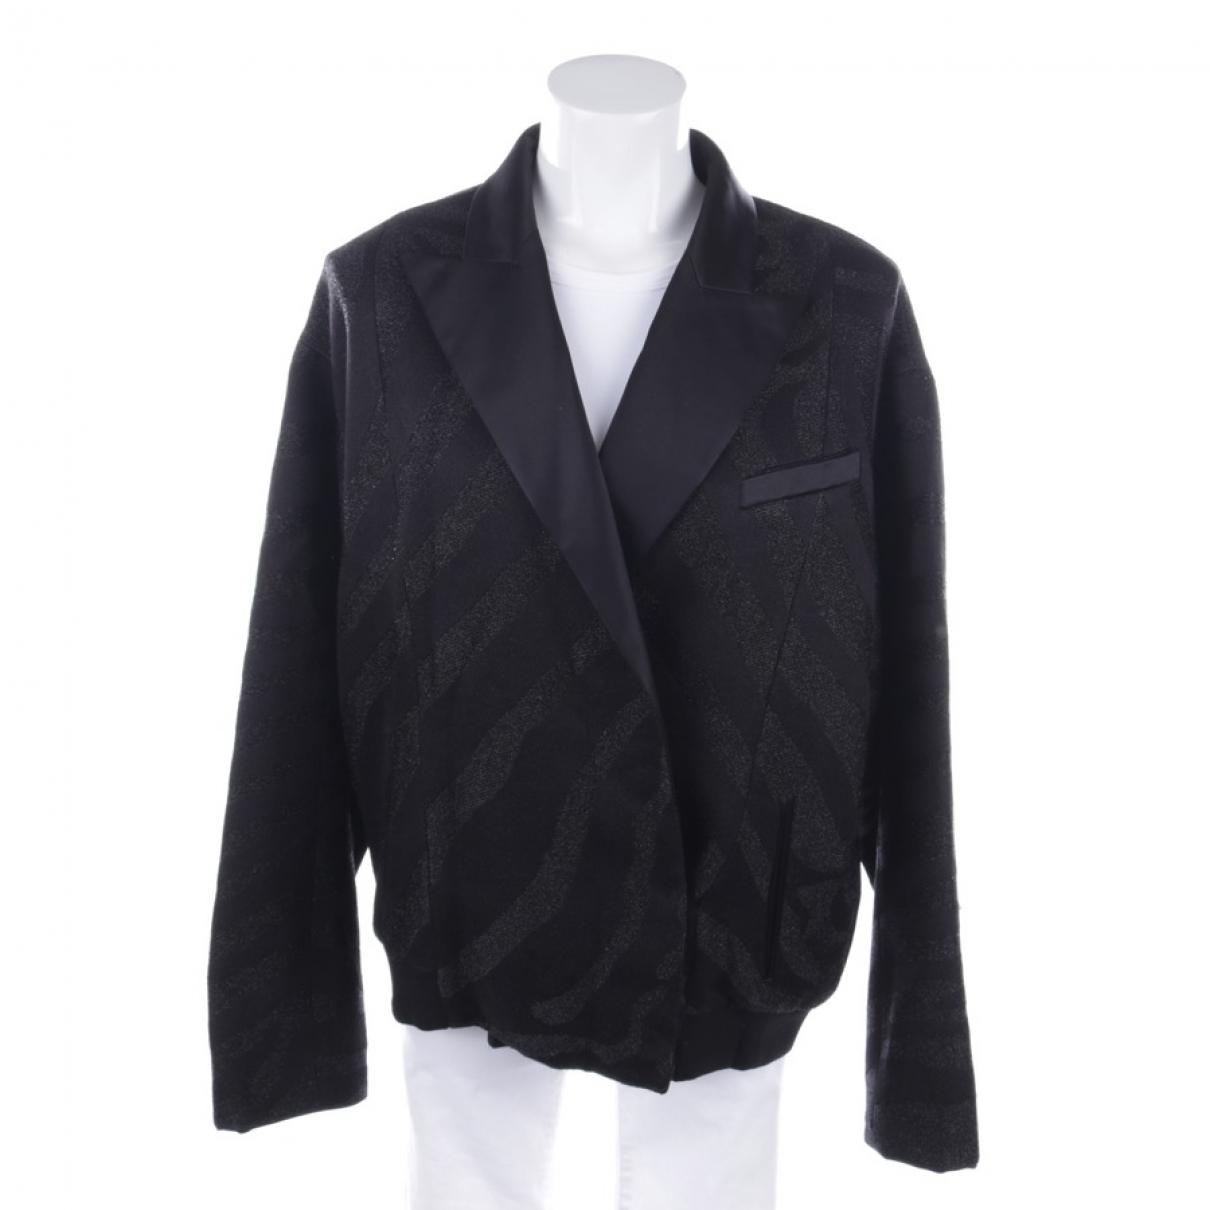 Balmain \N Black jacket for Women M International